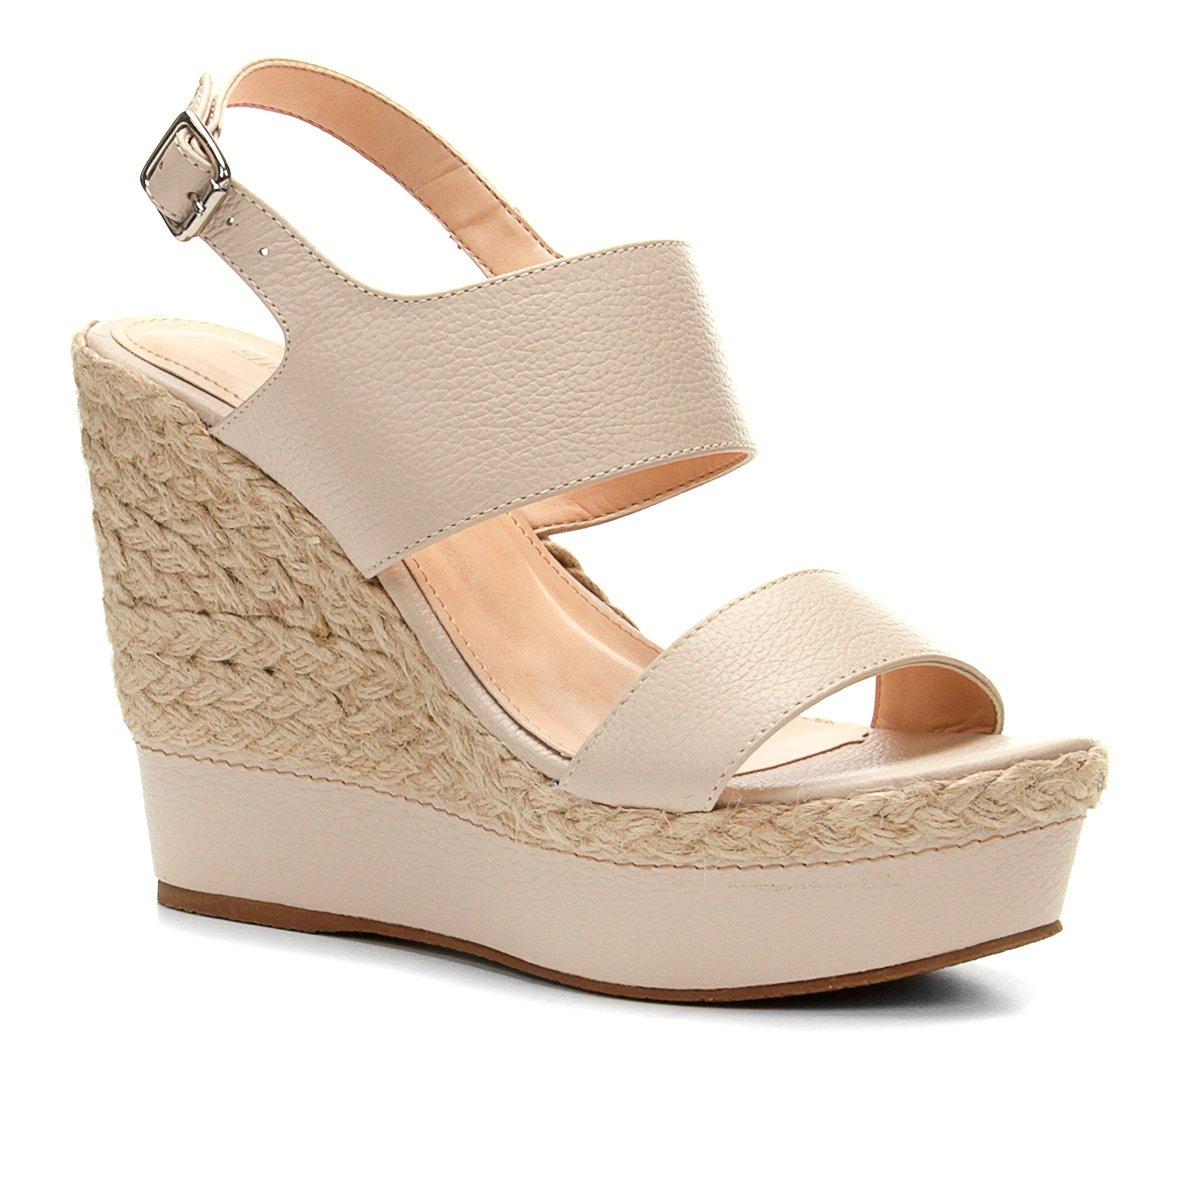 131c2b682b Sandália Plataforma Couro Shoestock Corda Feminina